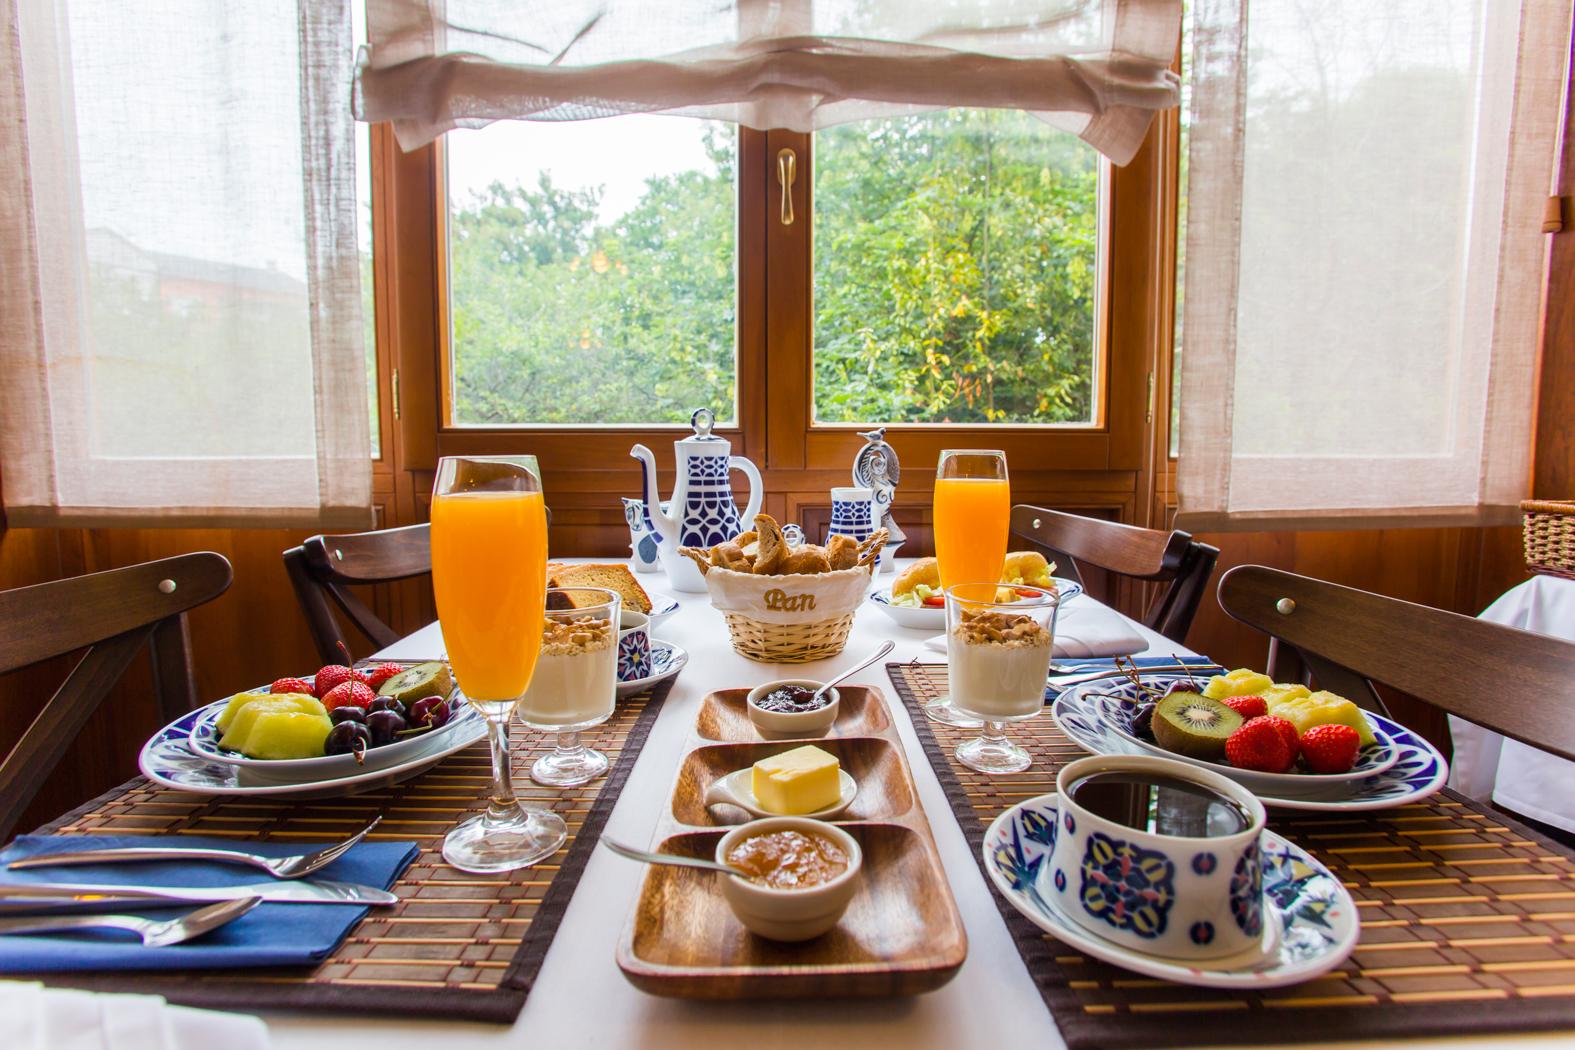 Desayunoenlamesa